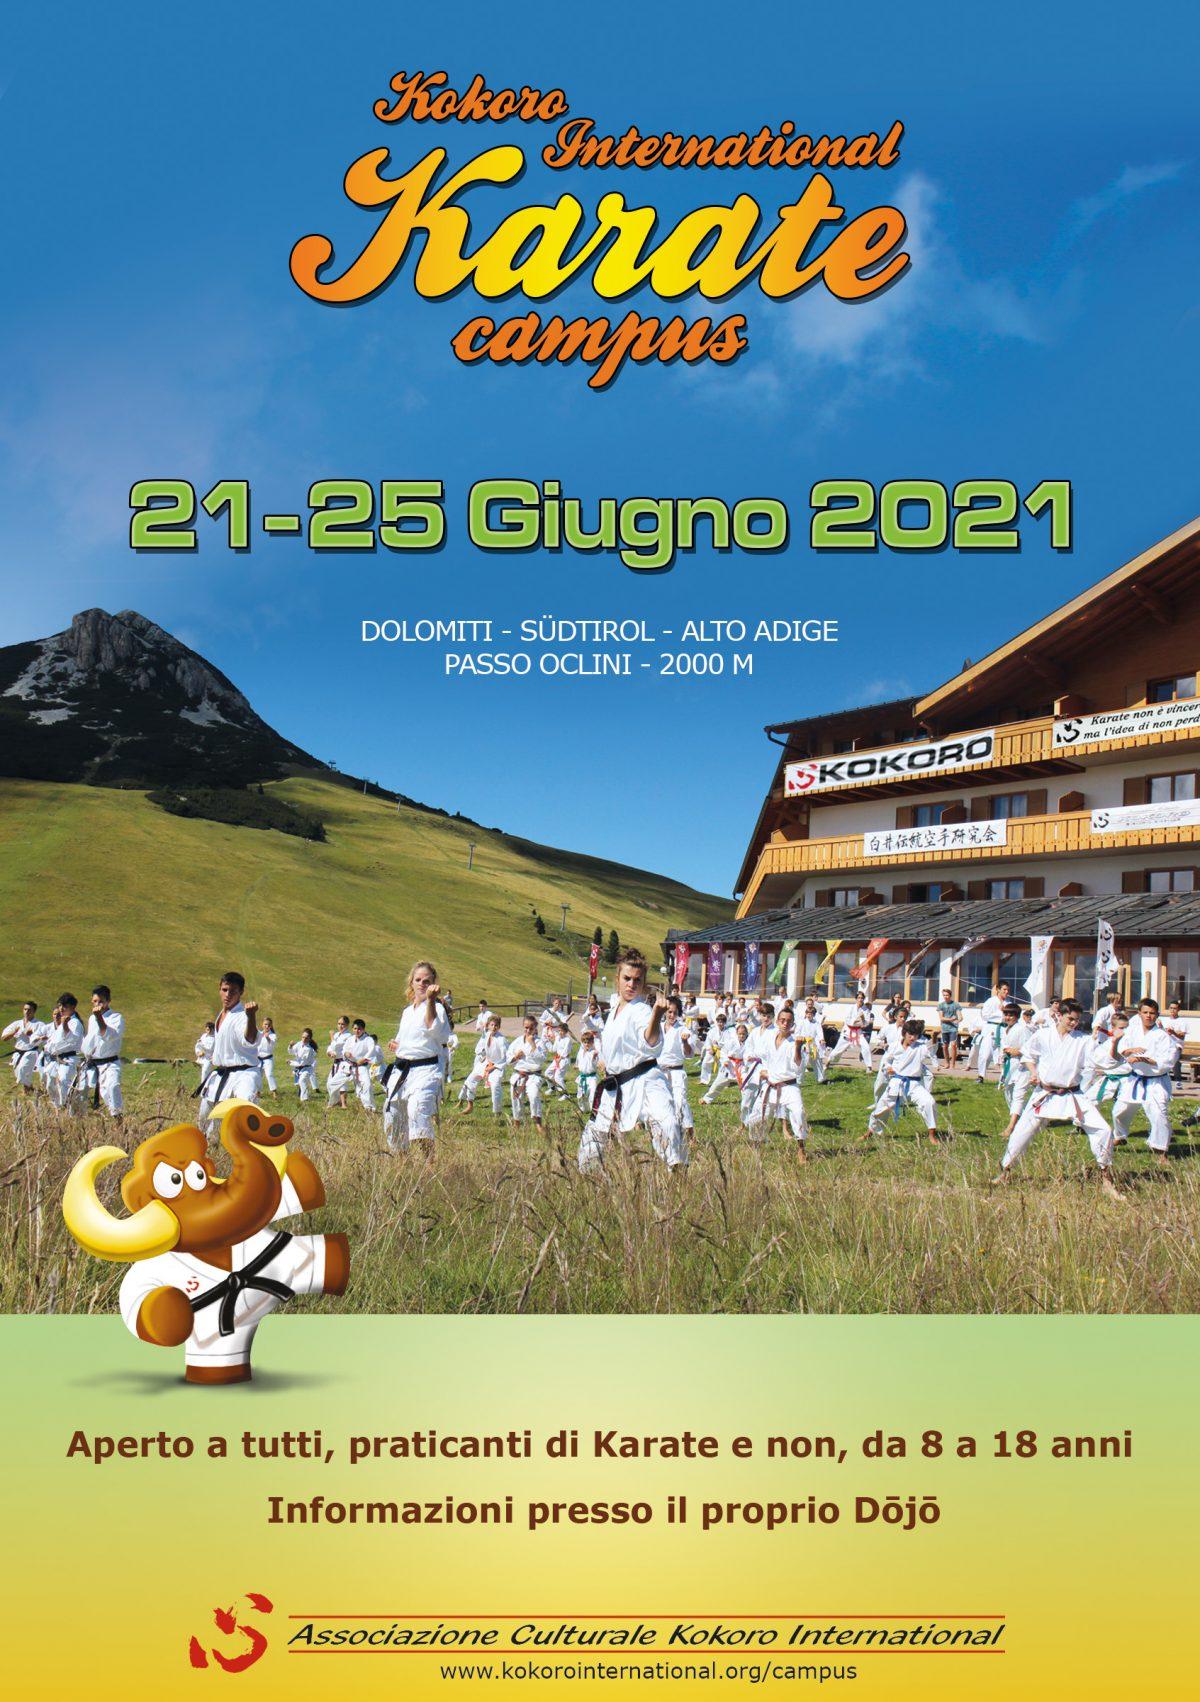 Kokoro International Karate Campus: Posticipato al 2021